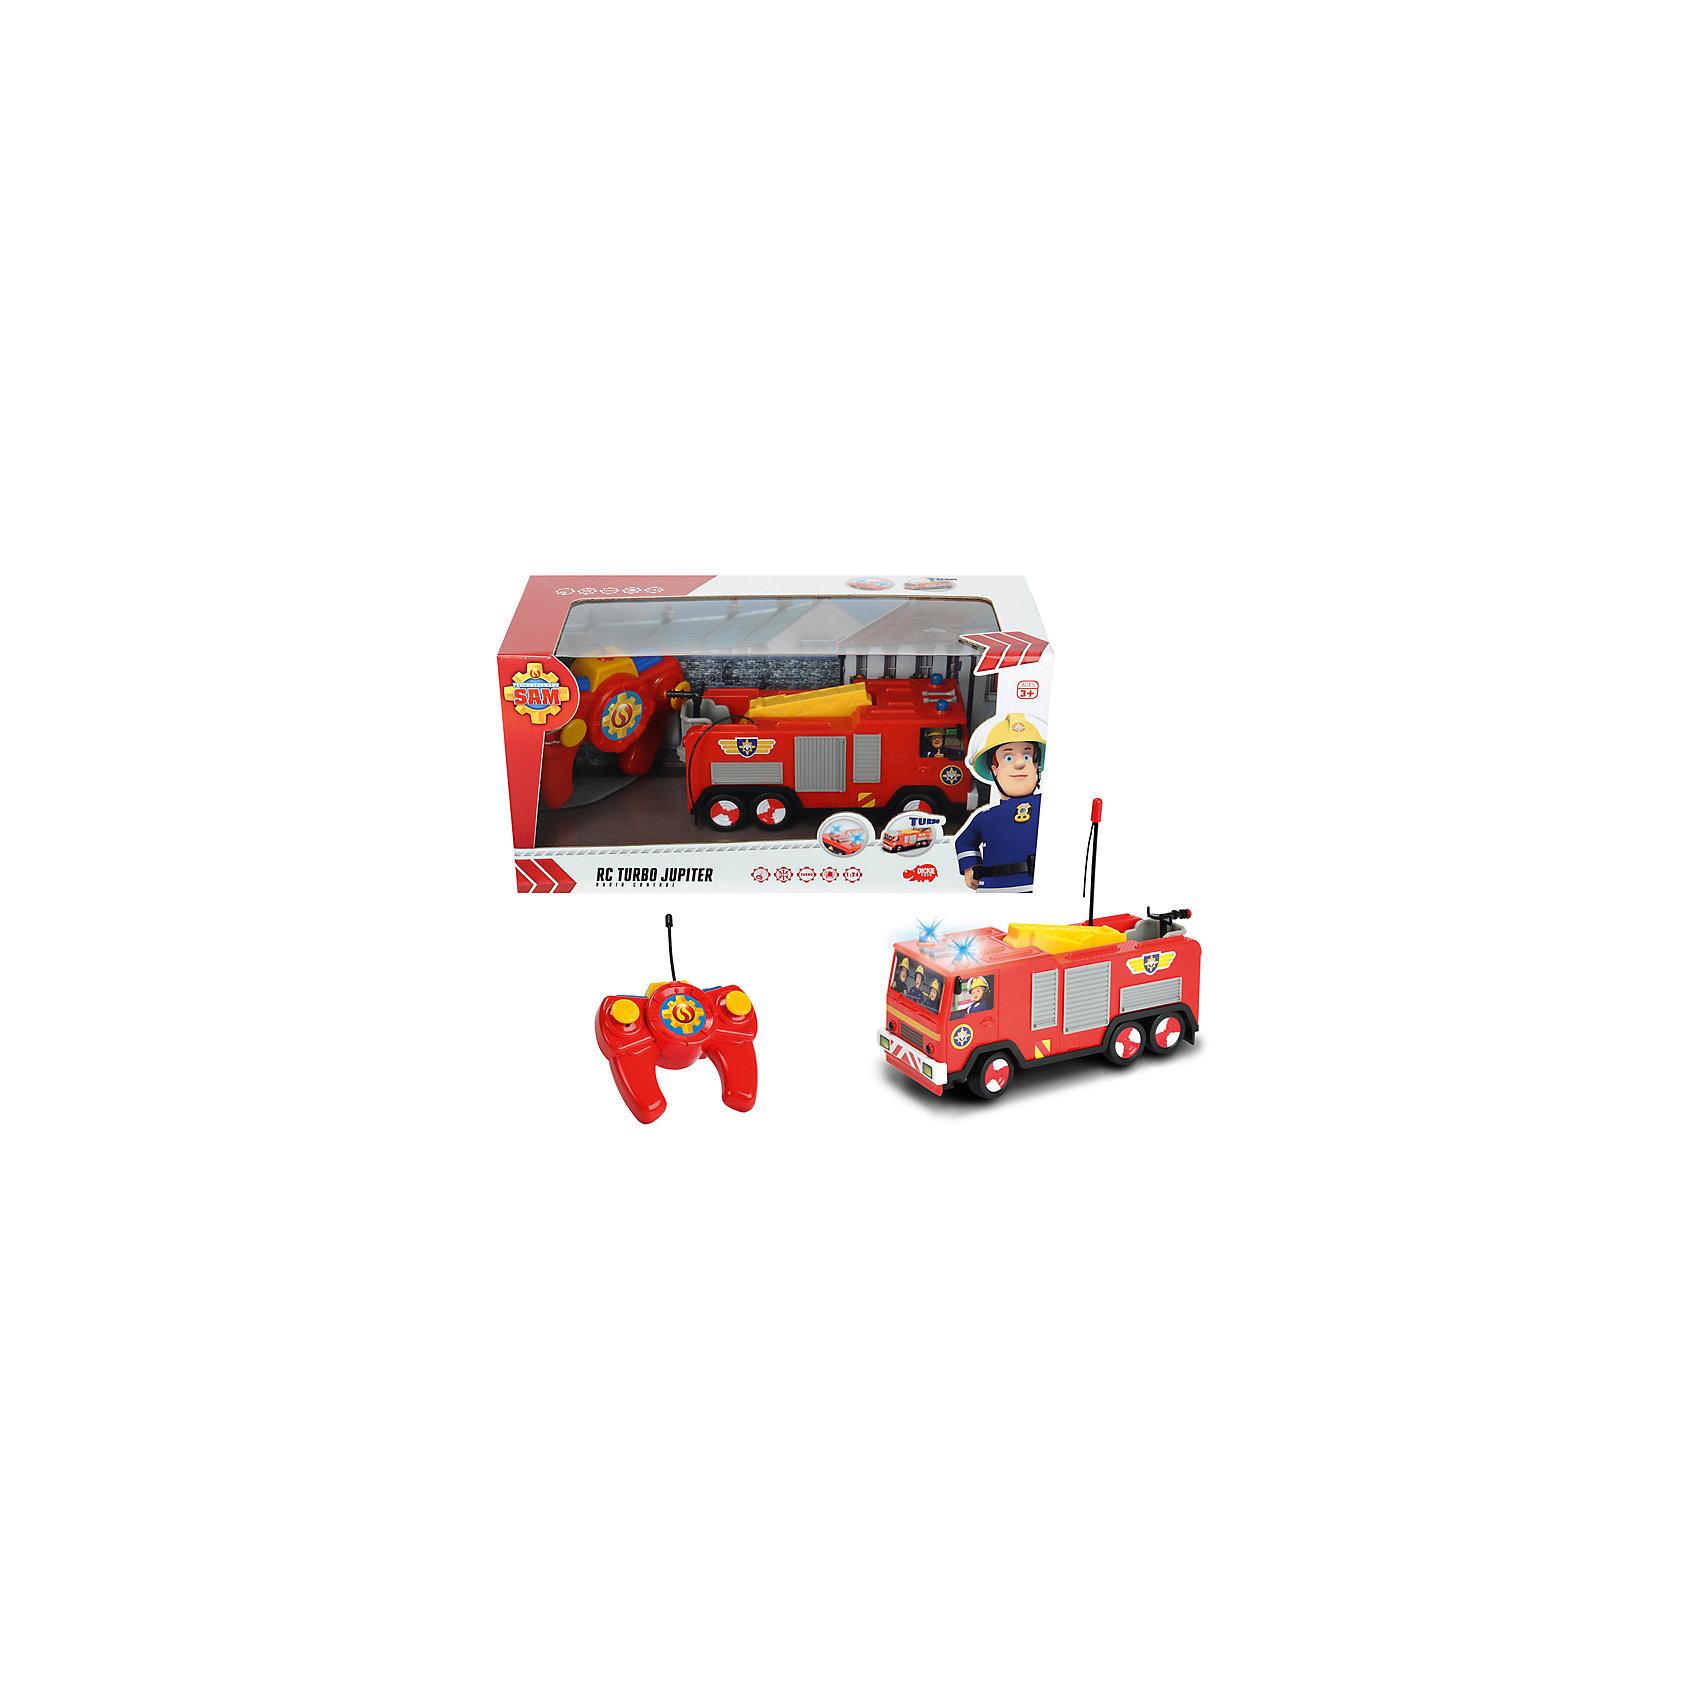 - Пожарная машина на р/у, Пожарный Сэм, Dickie квадроцикл dickie 3099613